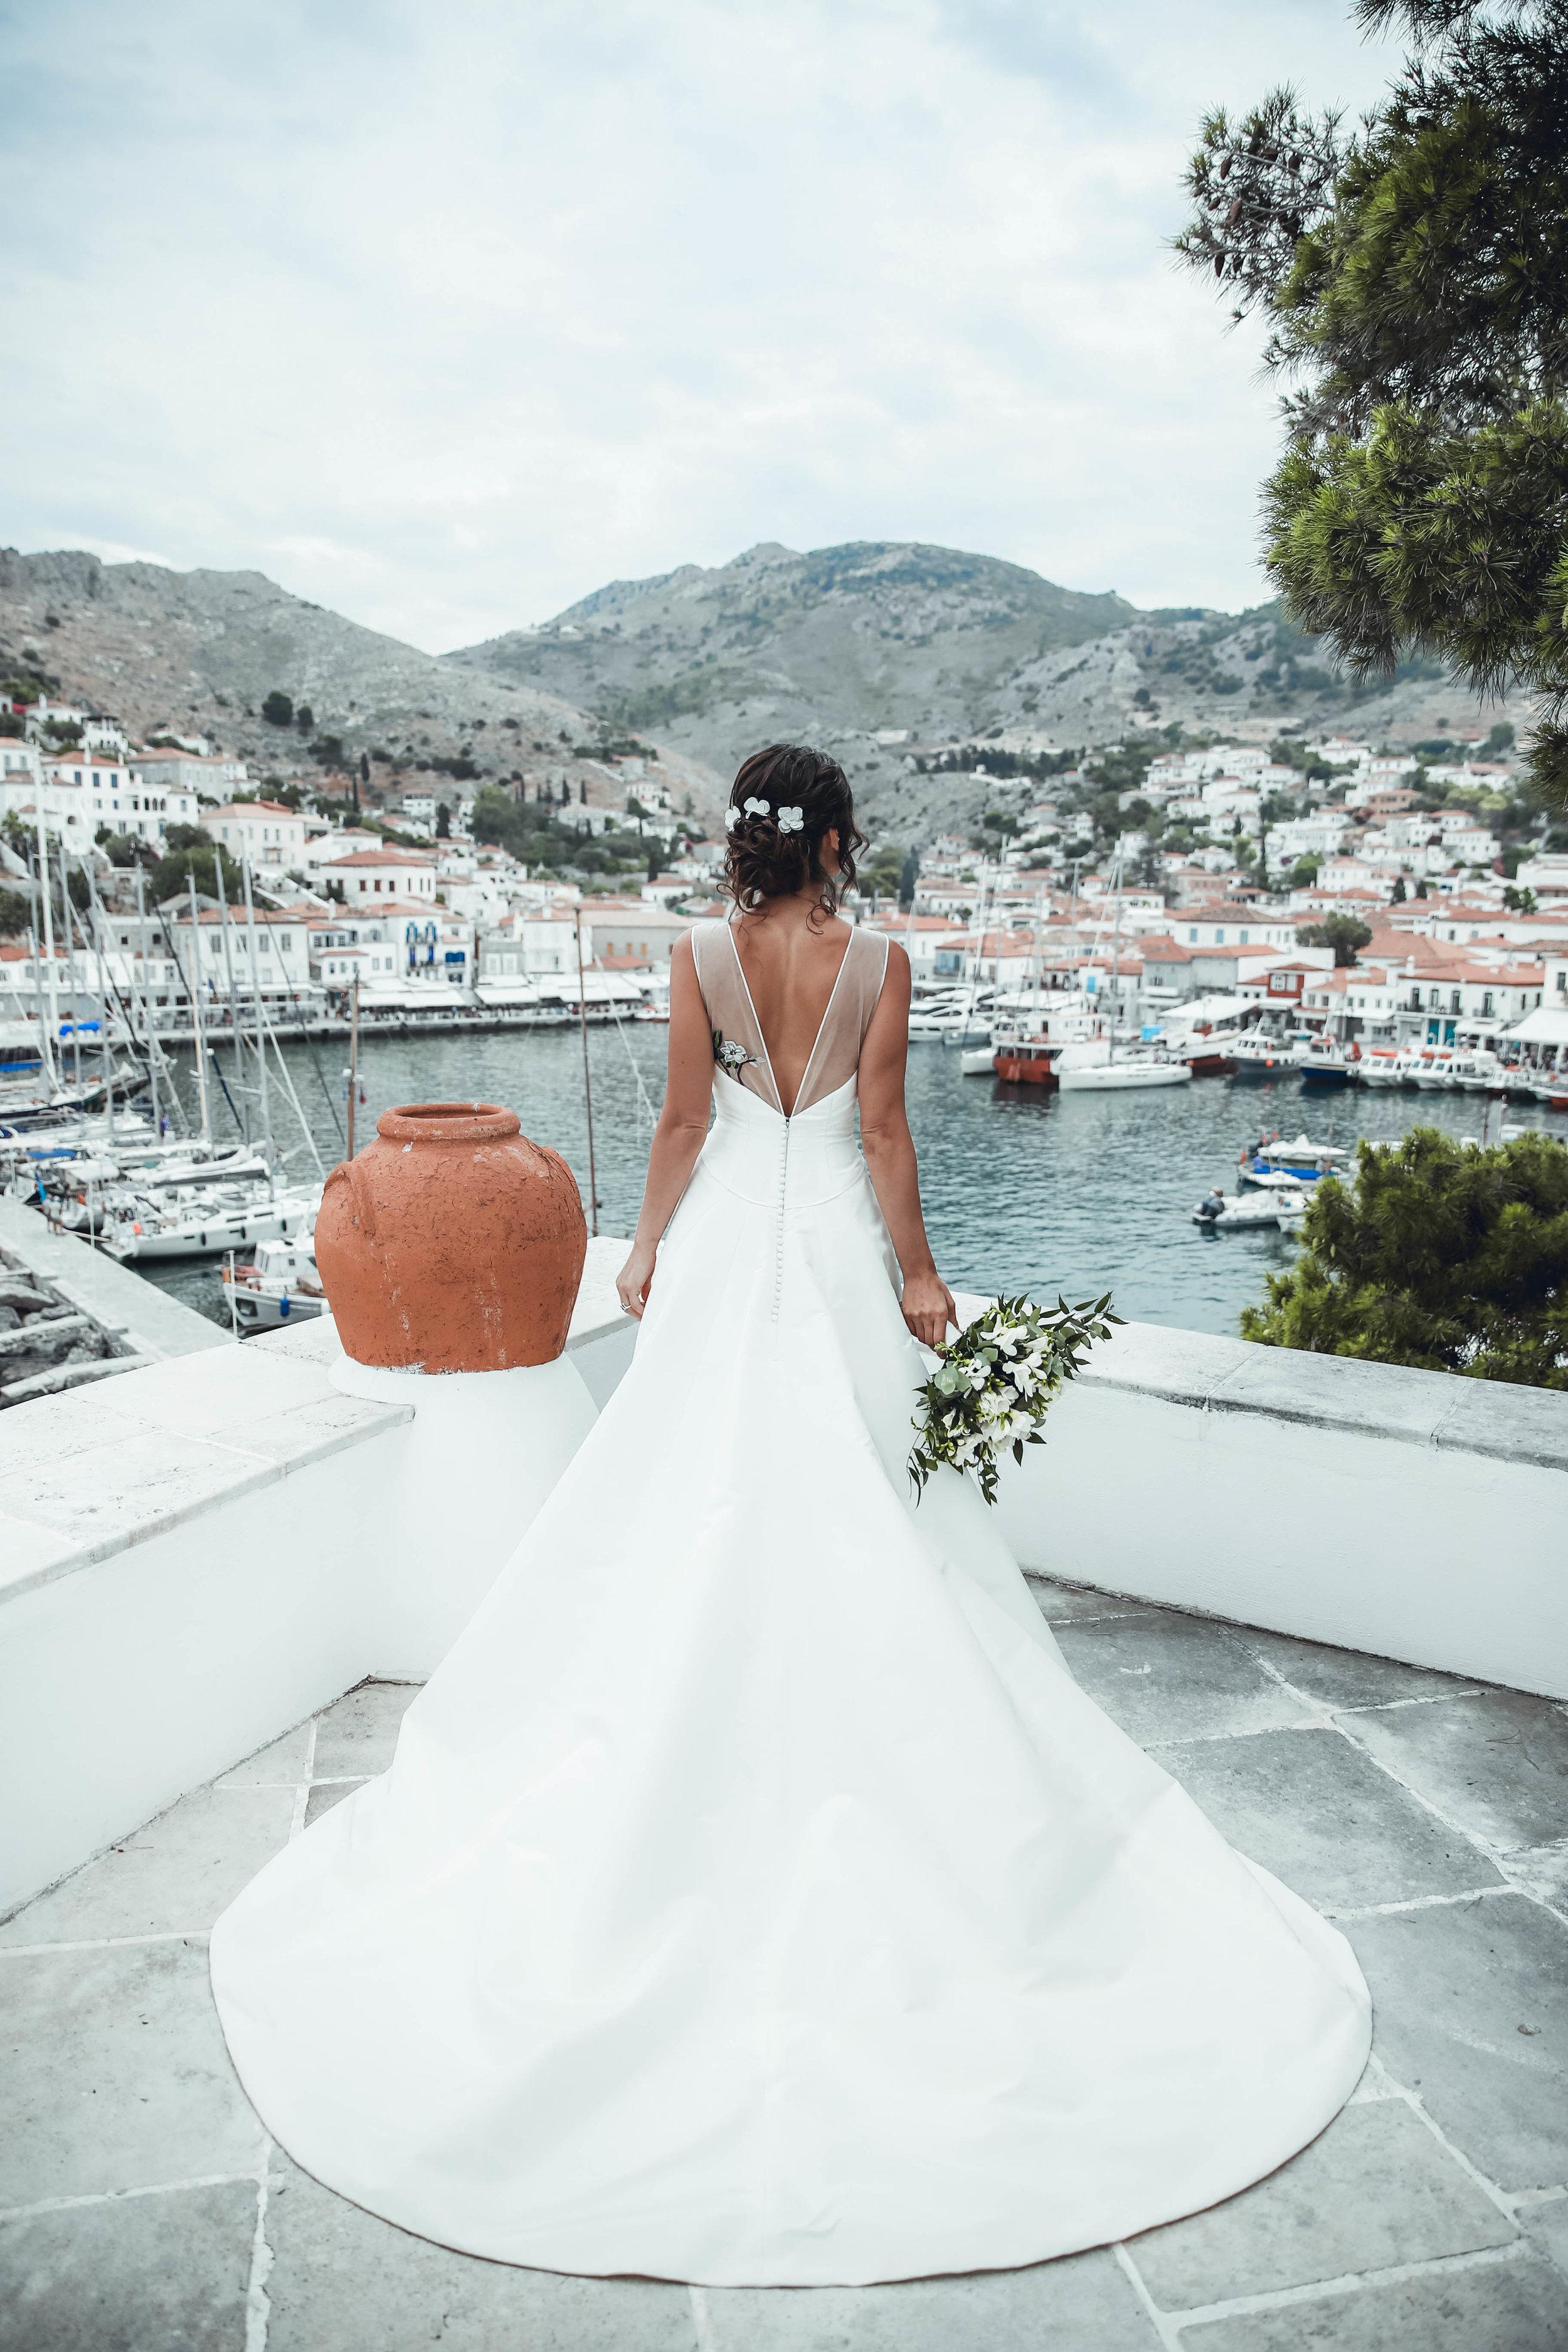 The Dress - The Jasmine